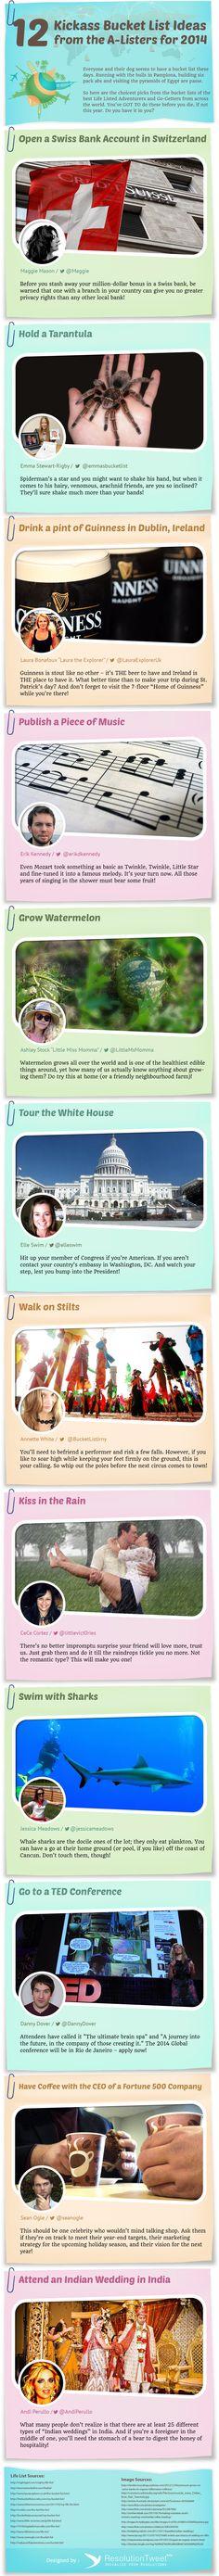 12 Kickass Bucket List Ideas For 2014   #Infographic #Entertainment #Travel